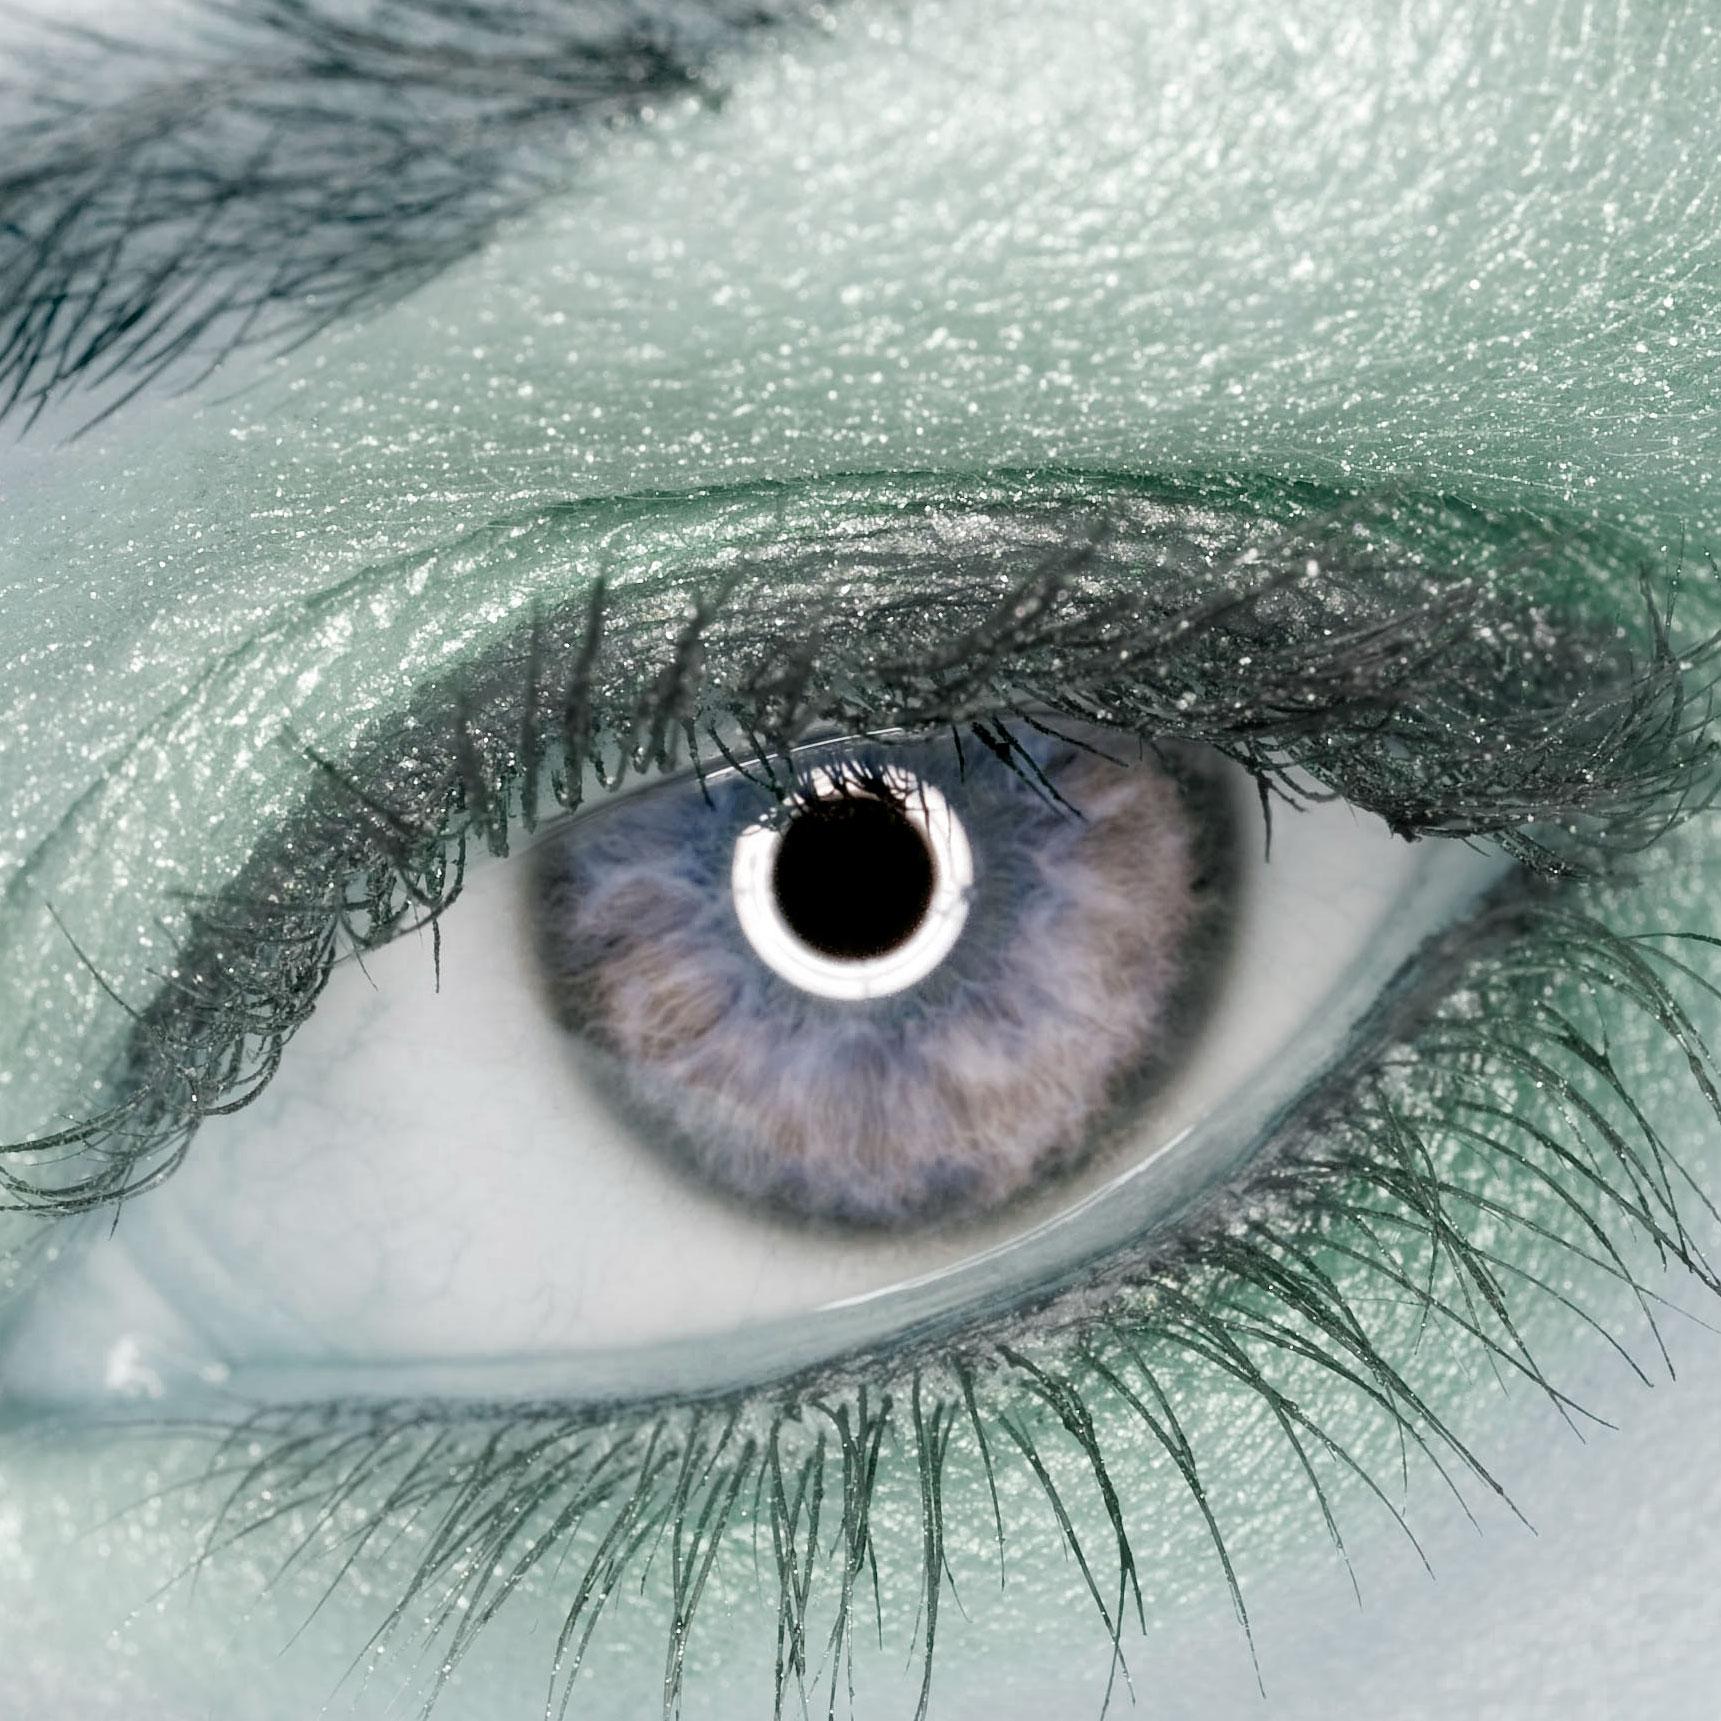 Ring flash in eye